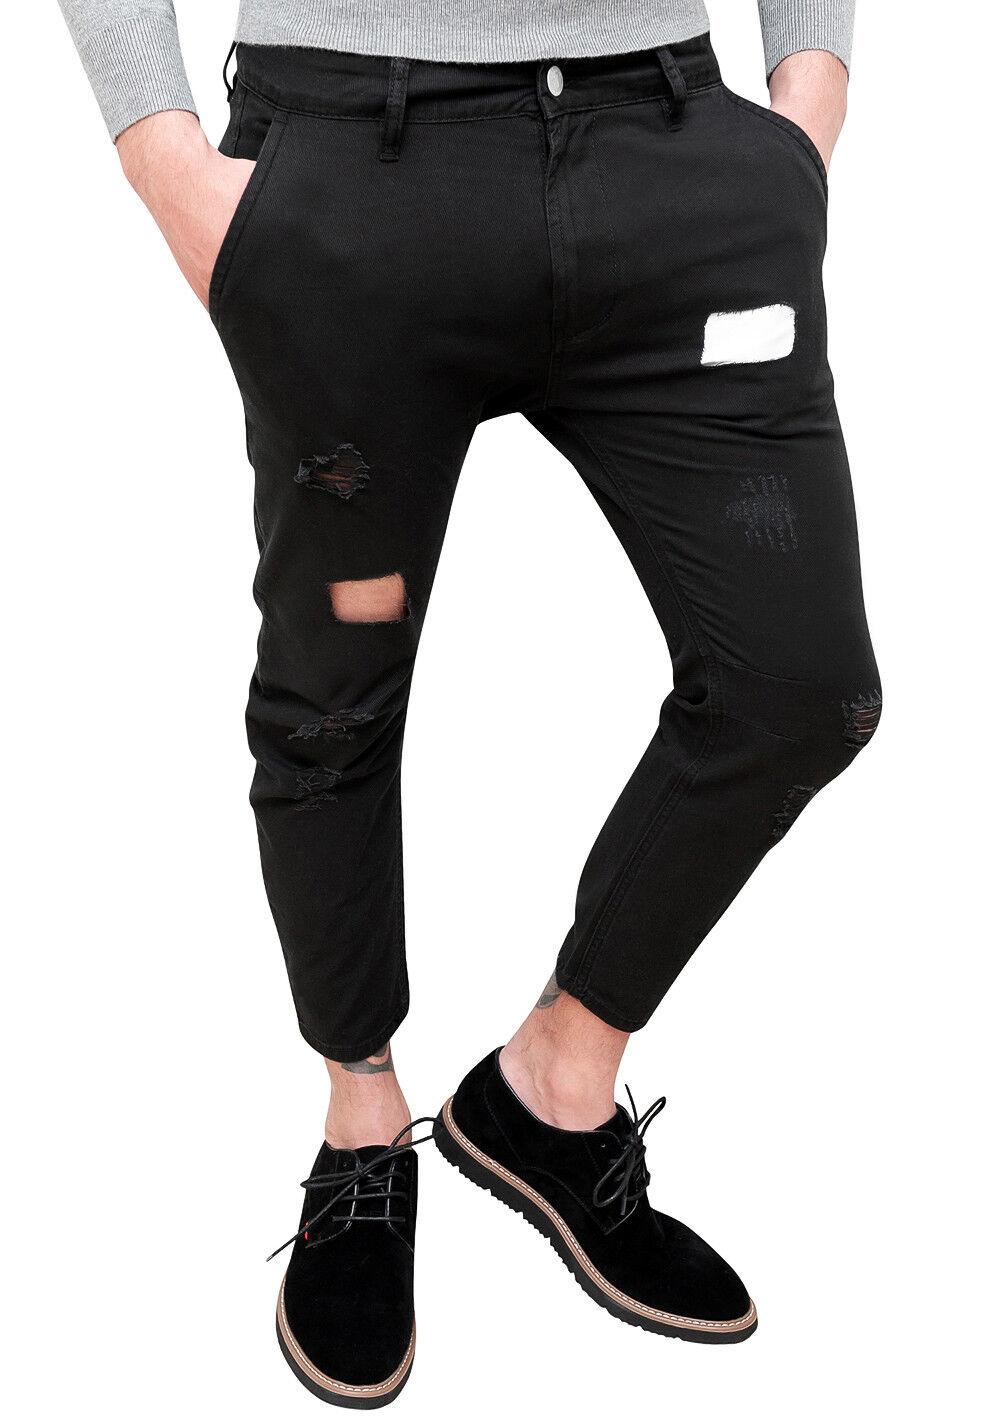 Capri Nero Pantalone Pantalone Pantalone Uomo Pantalone Capri Nero Uomo Uomo Nero Capri mfgIbY6yv7